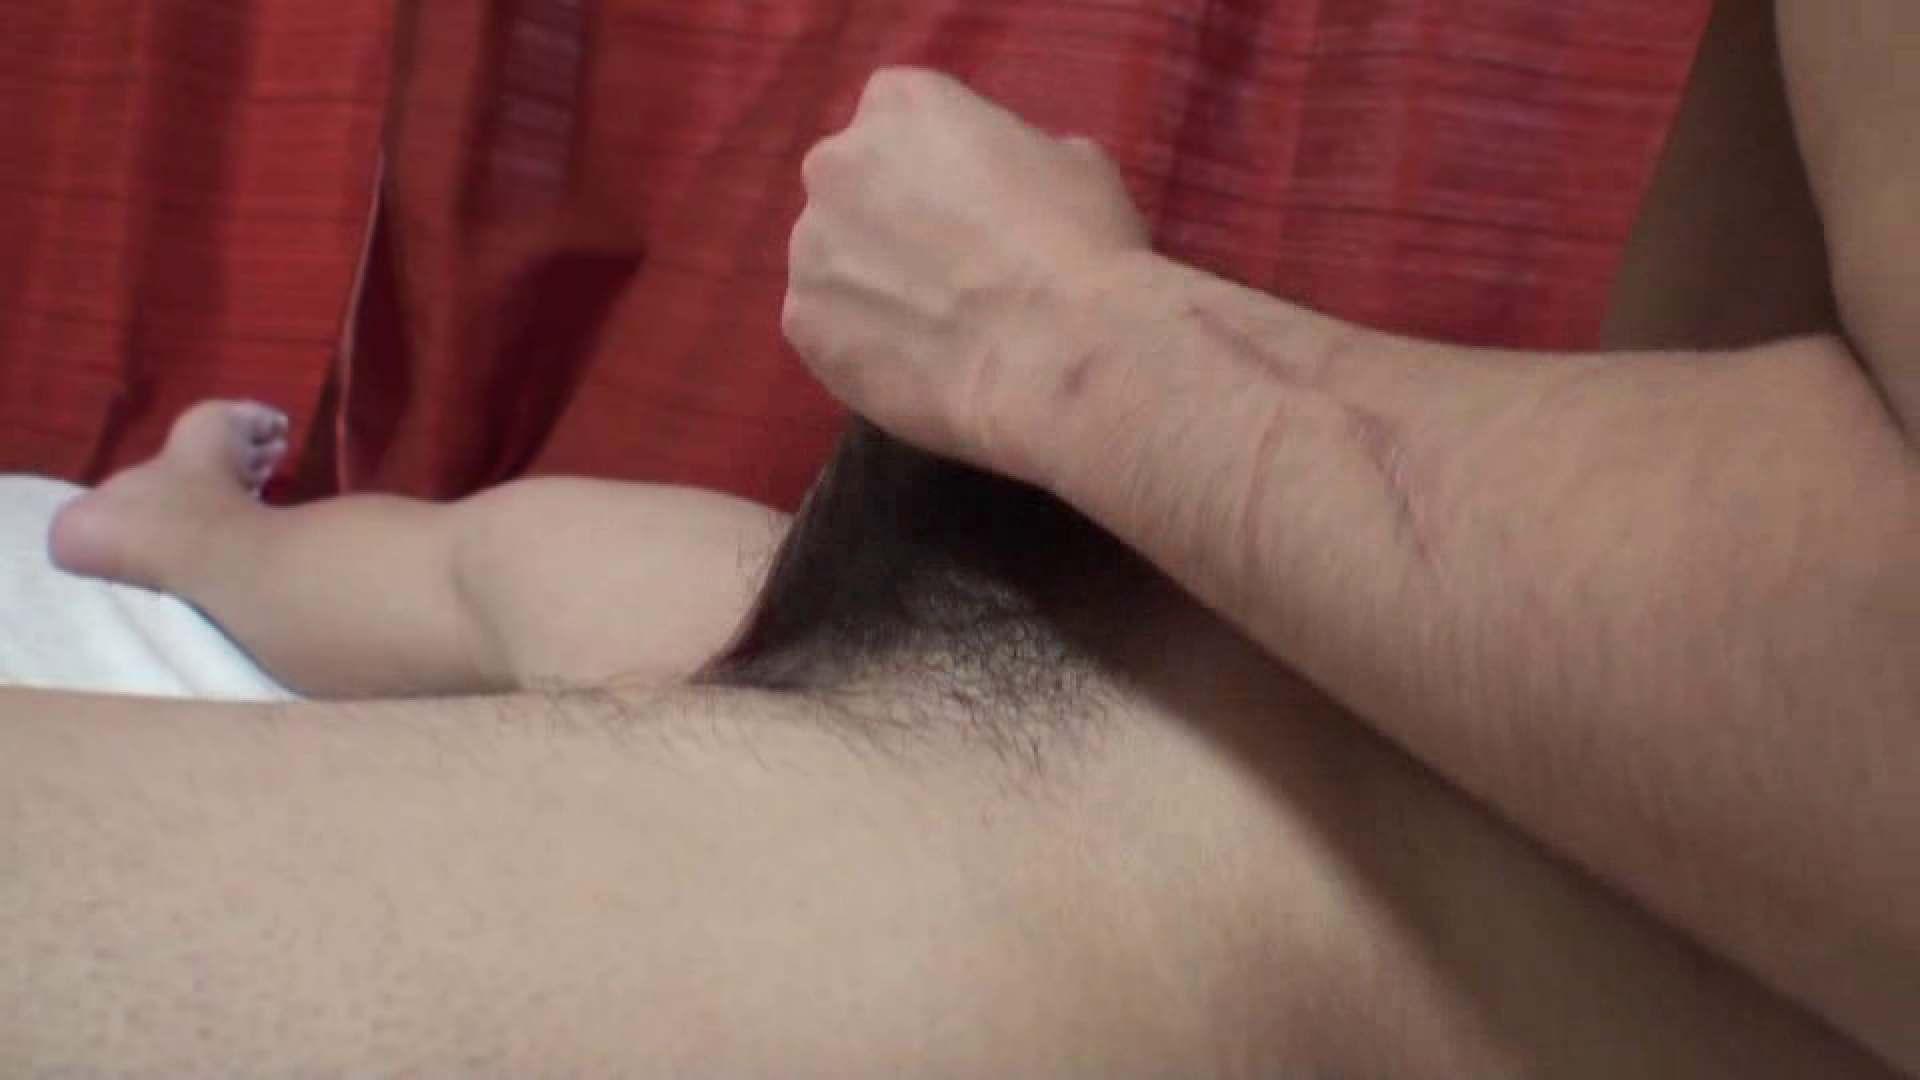 HD 良太と健二当たり前の日常 セックス編 VOL.03 セックス | 0  52pic 27